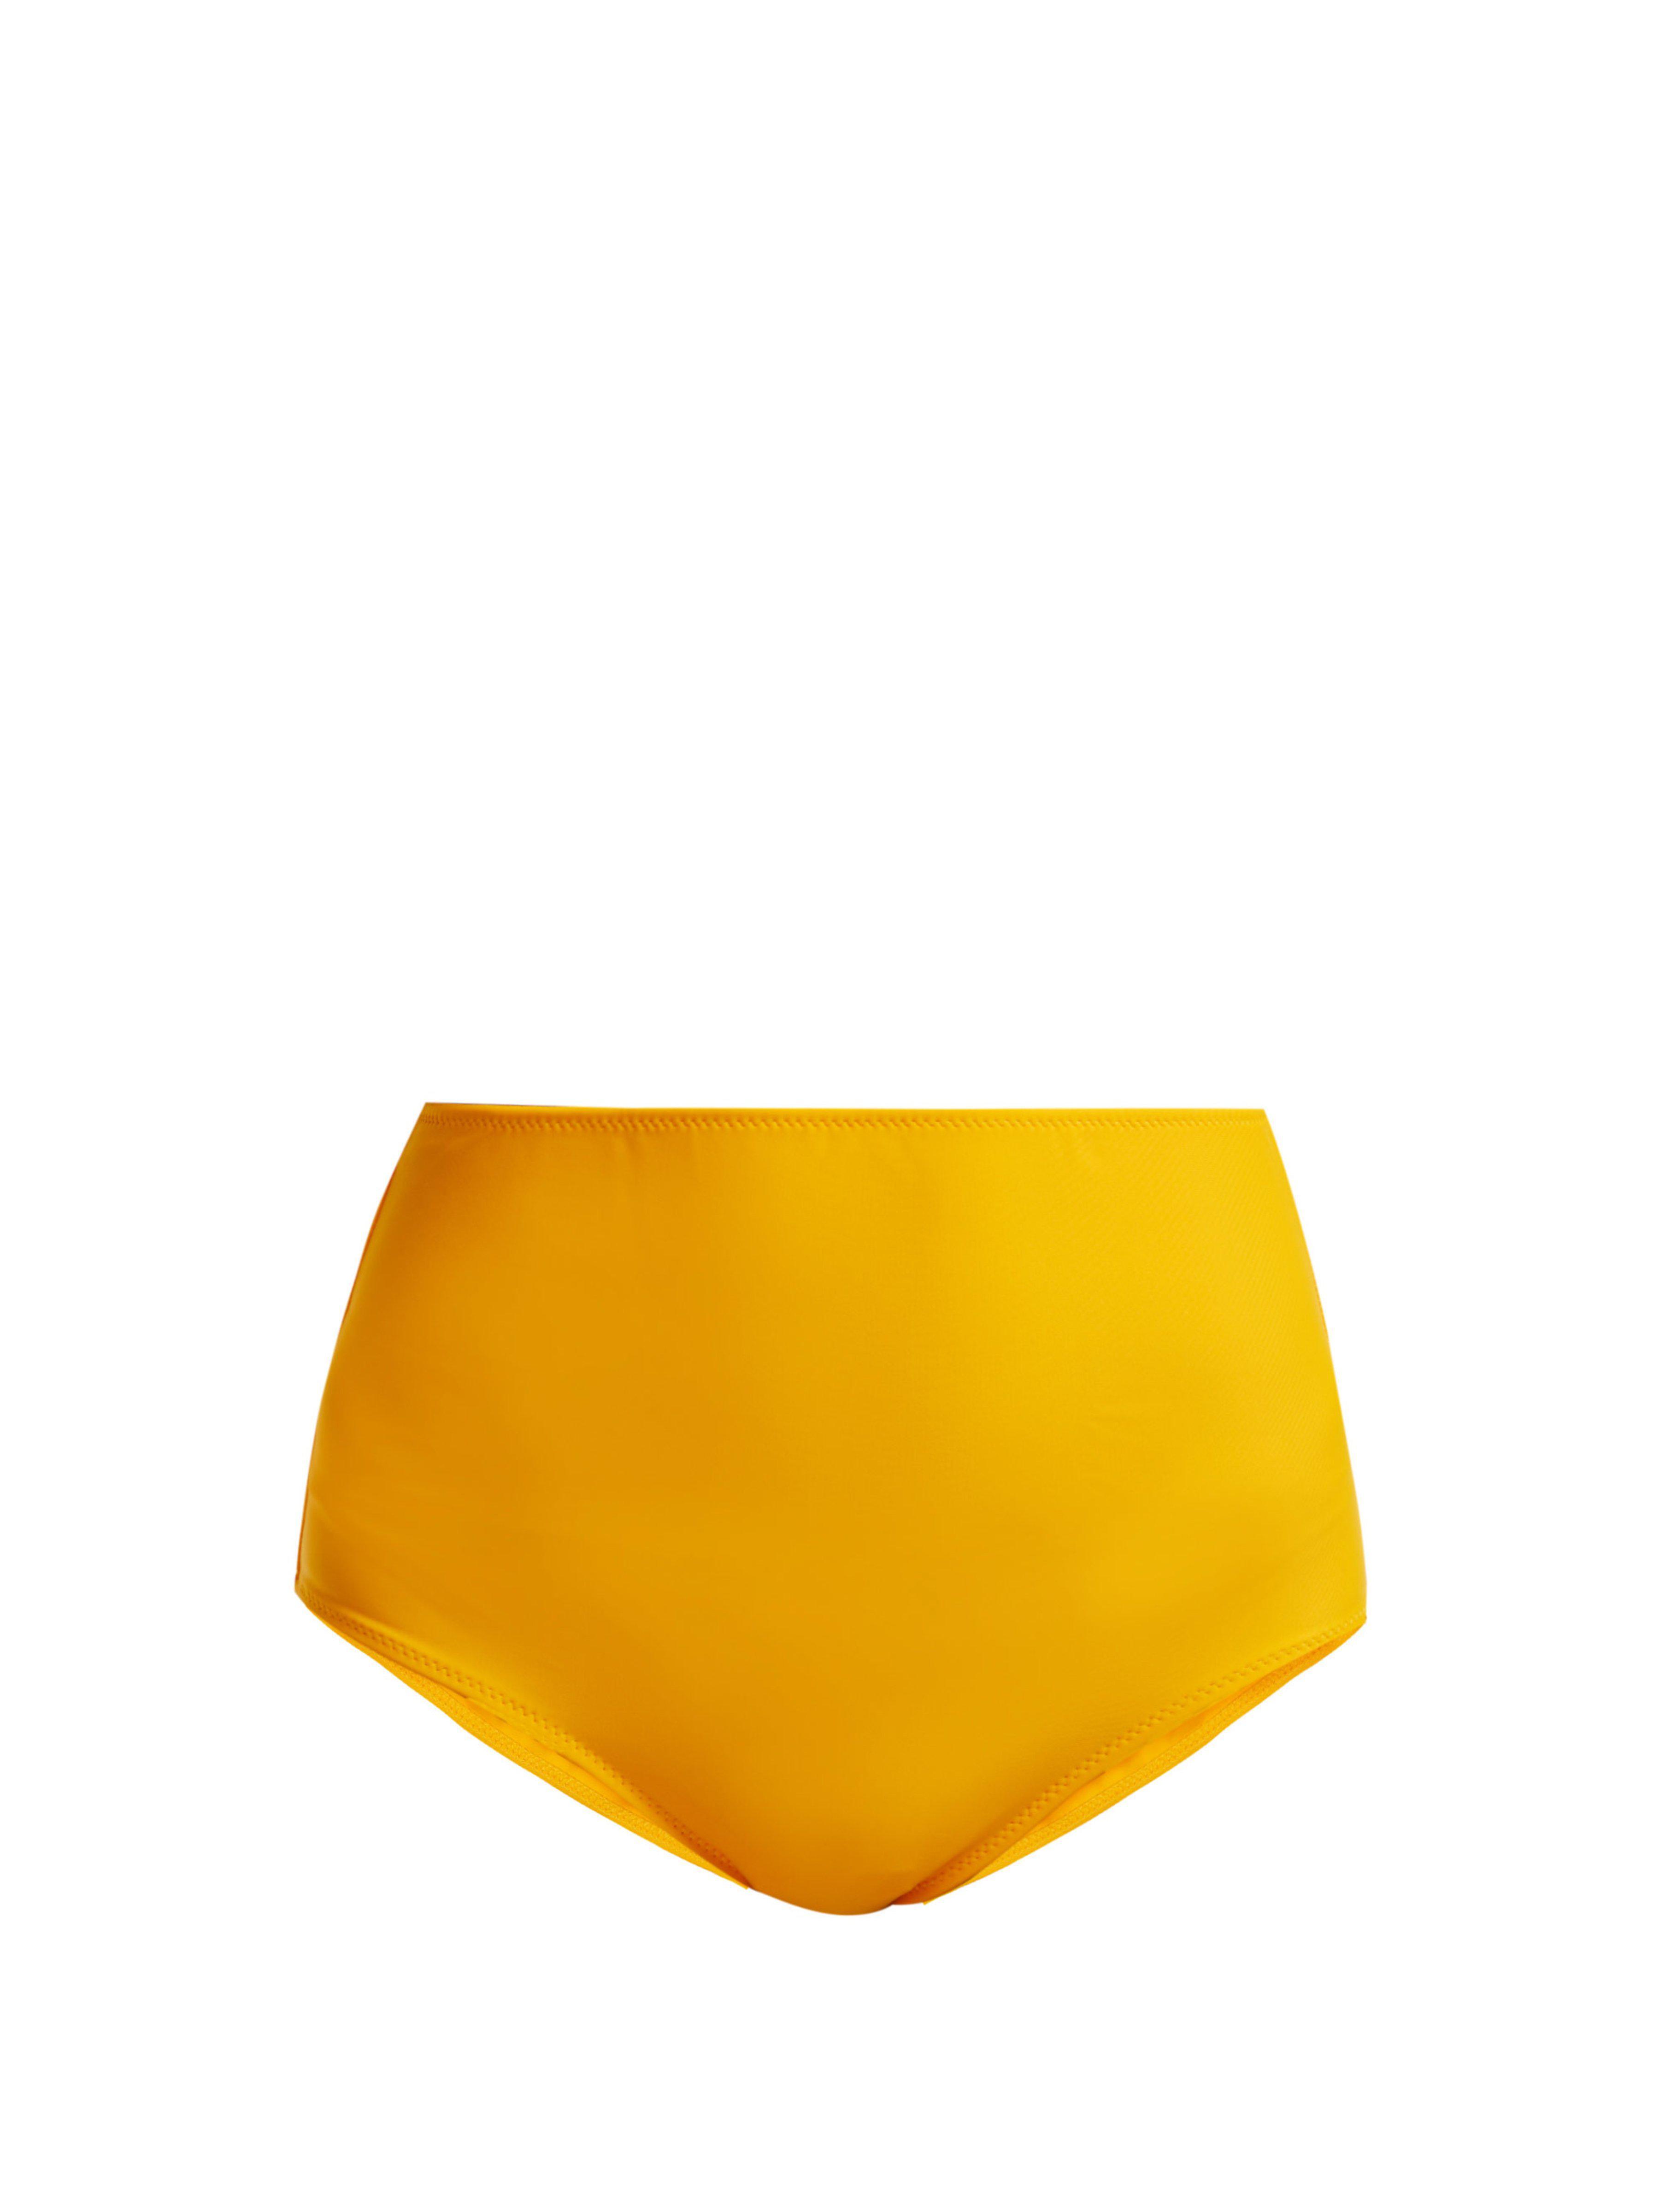 d9ade106257 Araks Mallory High Waisted Bikini Briefs in Yellow - Lyst